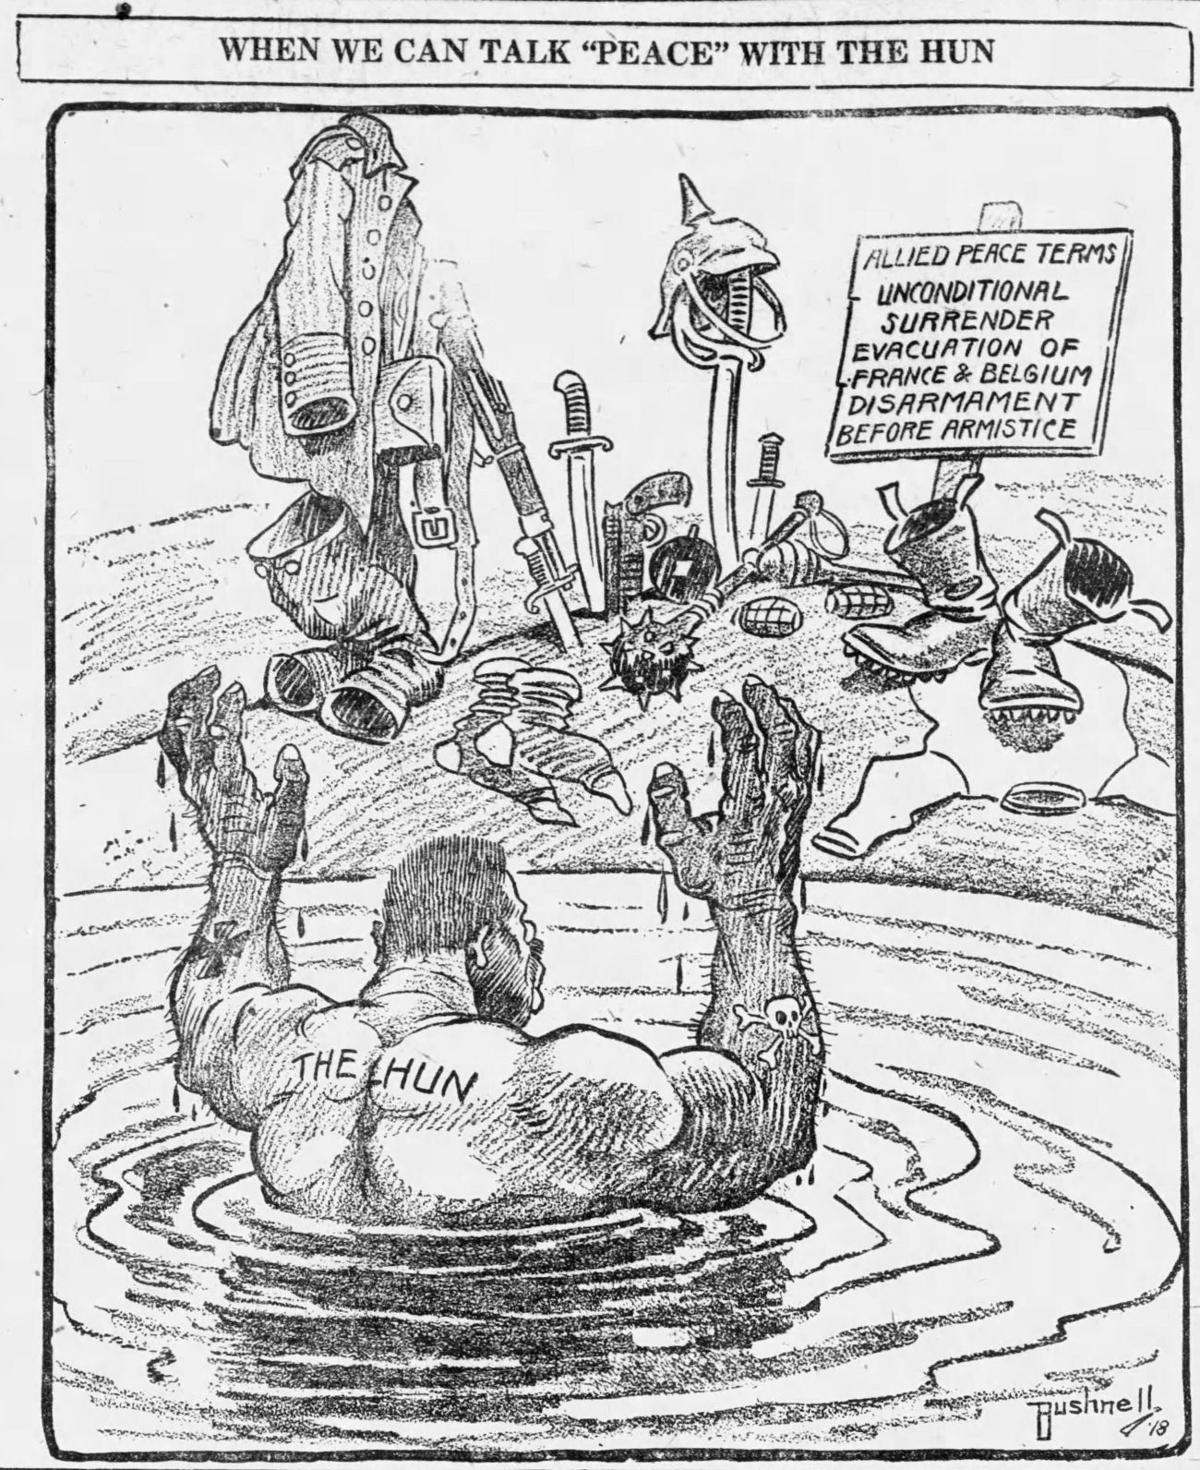 World War I editorial cartoon